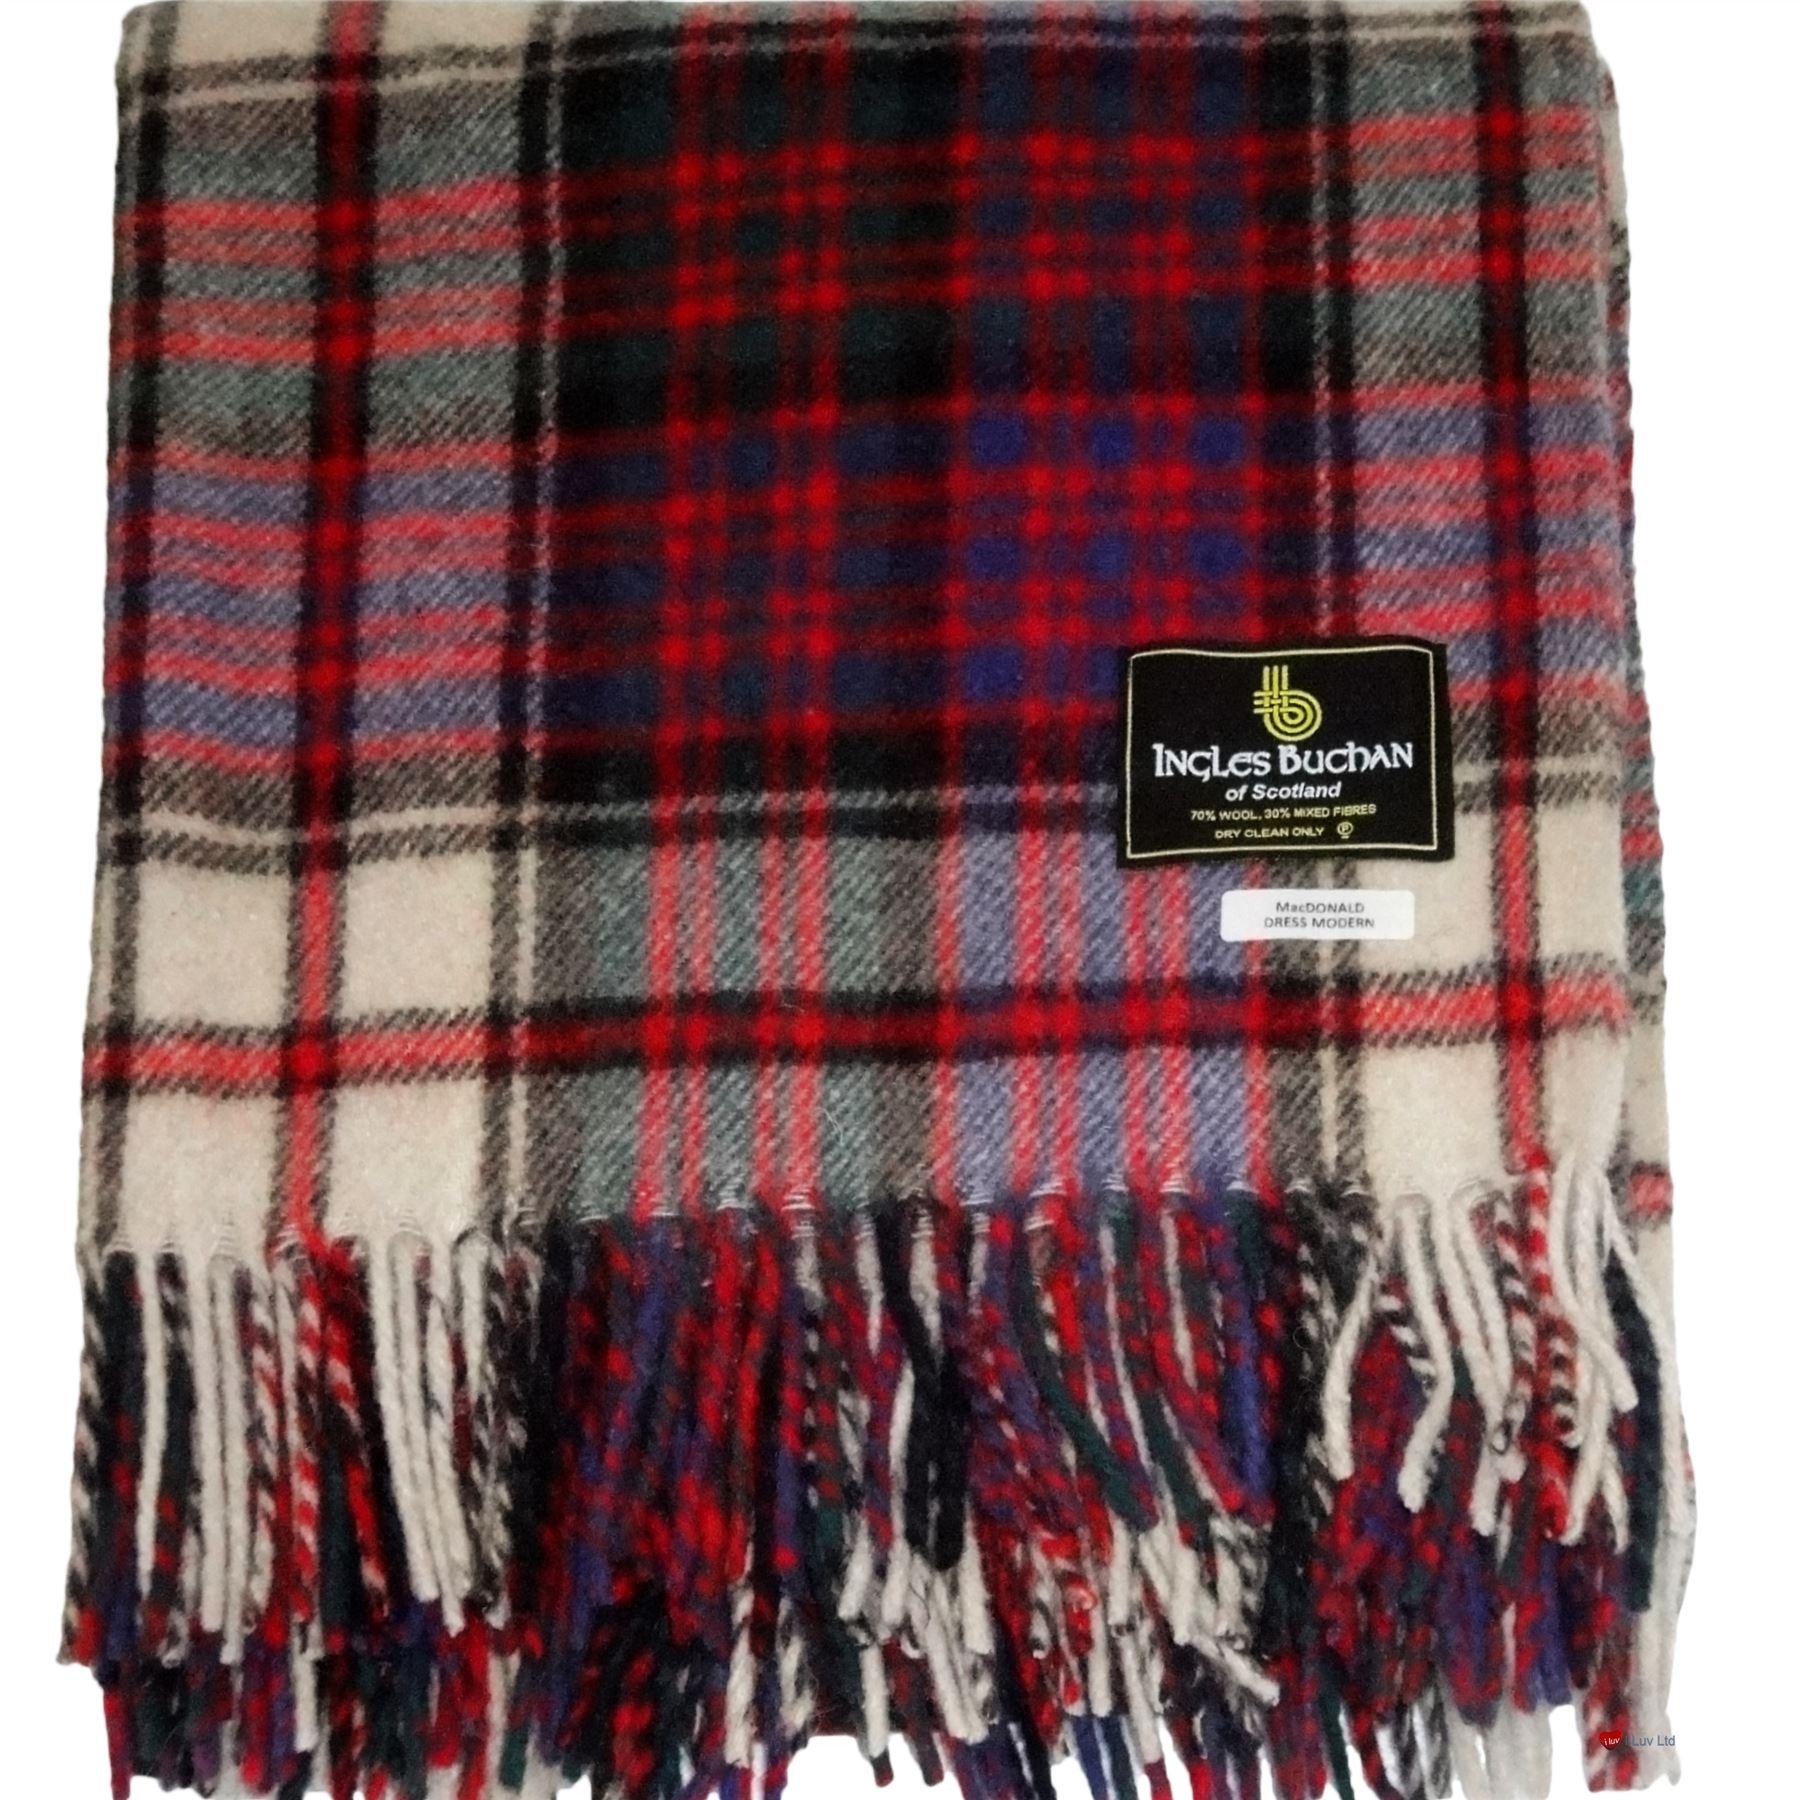 Tartan Blanket Picnic Rug Wool Mix Scottish Anderson Modern Tartan